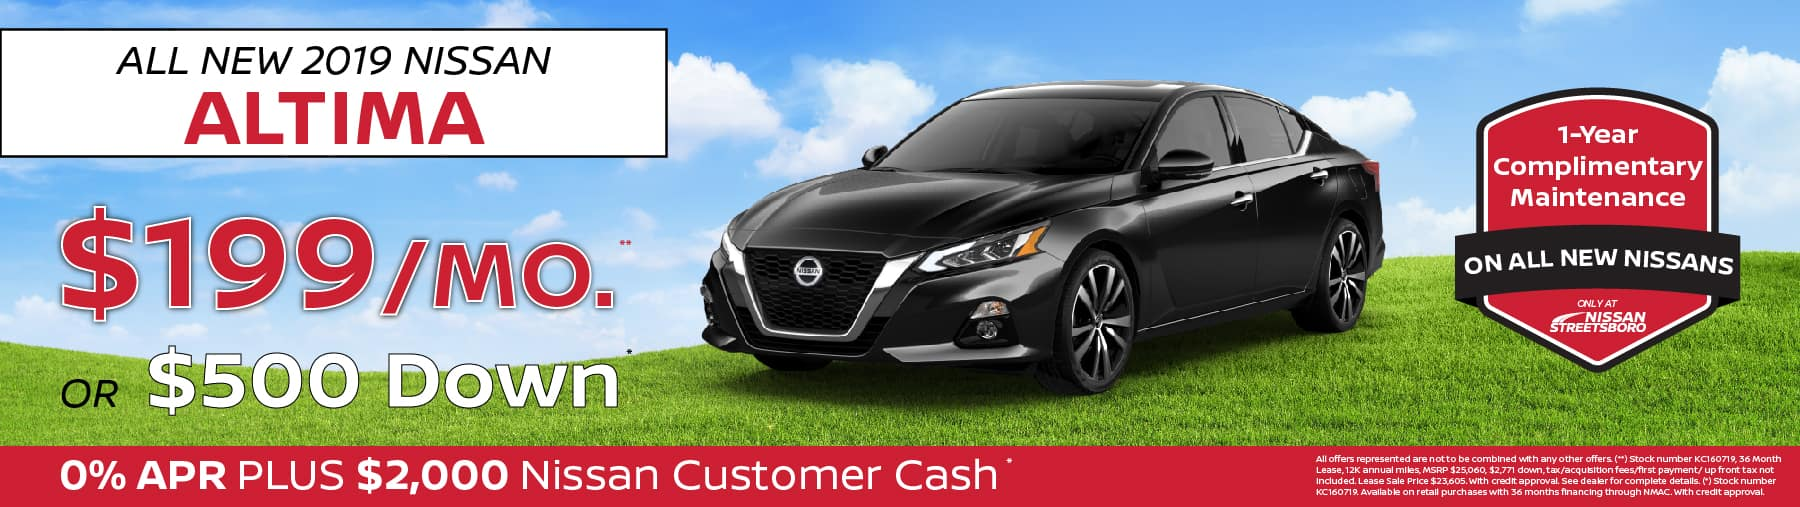 Nissan Altima Special Ohio